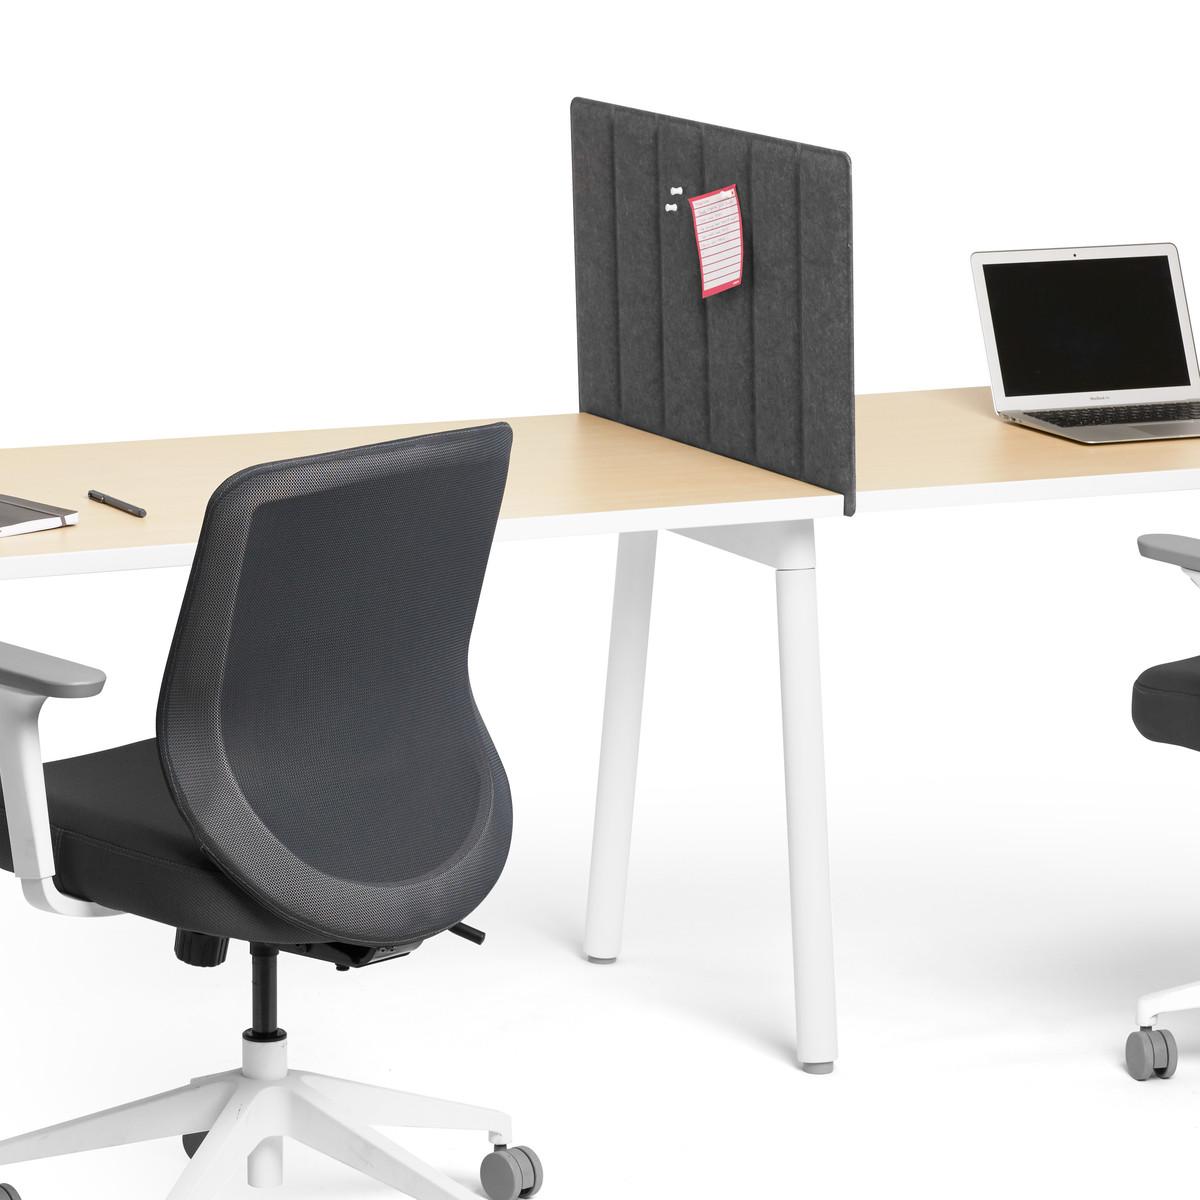 Desk Privacy Panel  Hostgarcia. Ikea Desk Shelves. End Table With Drawer And Shelf. Computer Monitor Desk Mount. Wood Drawers For Closet. Conference Desk. Space Saving Desk Ideas. Desks Antique Style. Sofa Table Plans